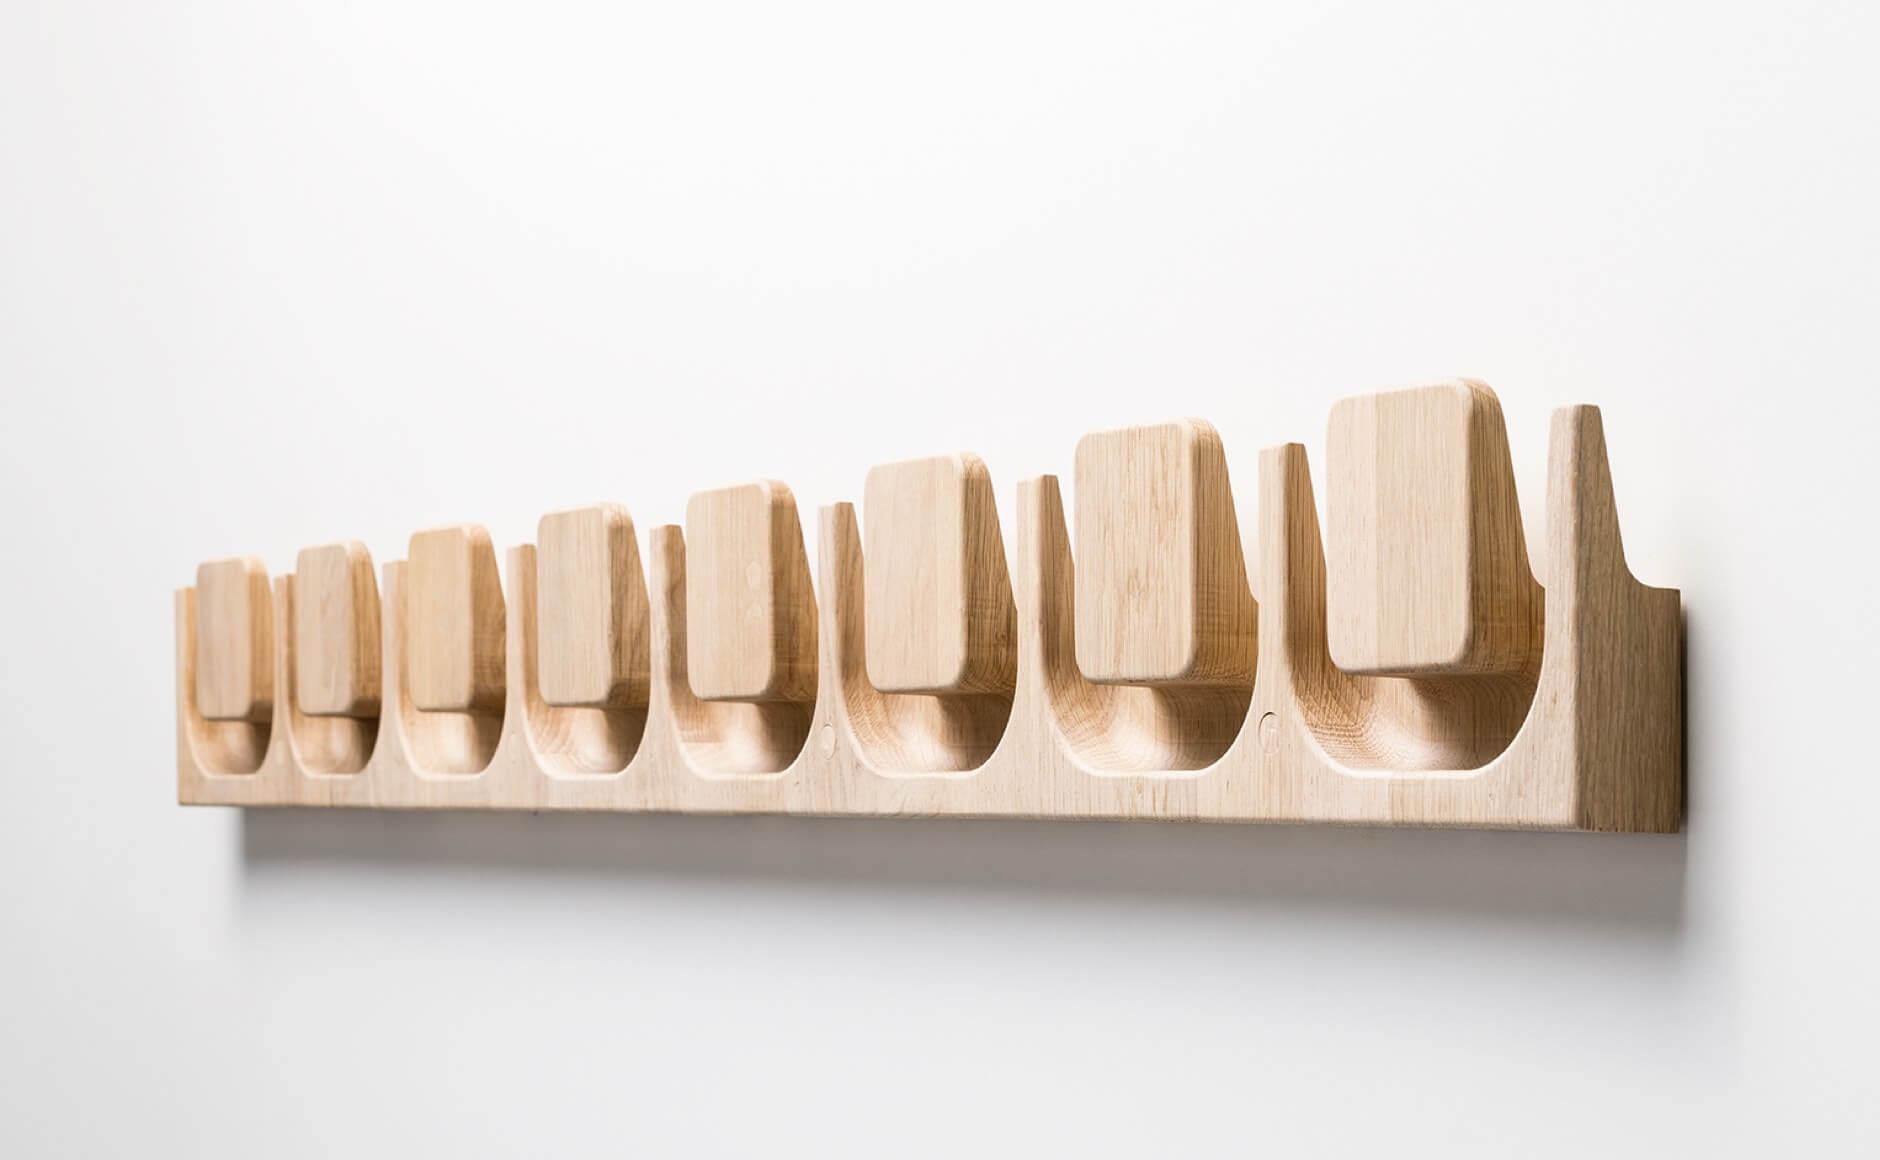 slide-1-finally-home-design-adrien-rovero